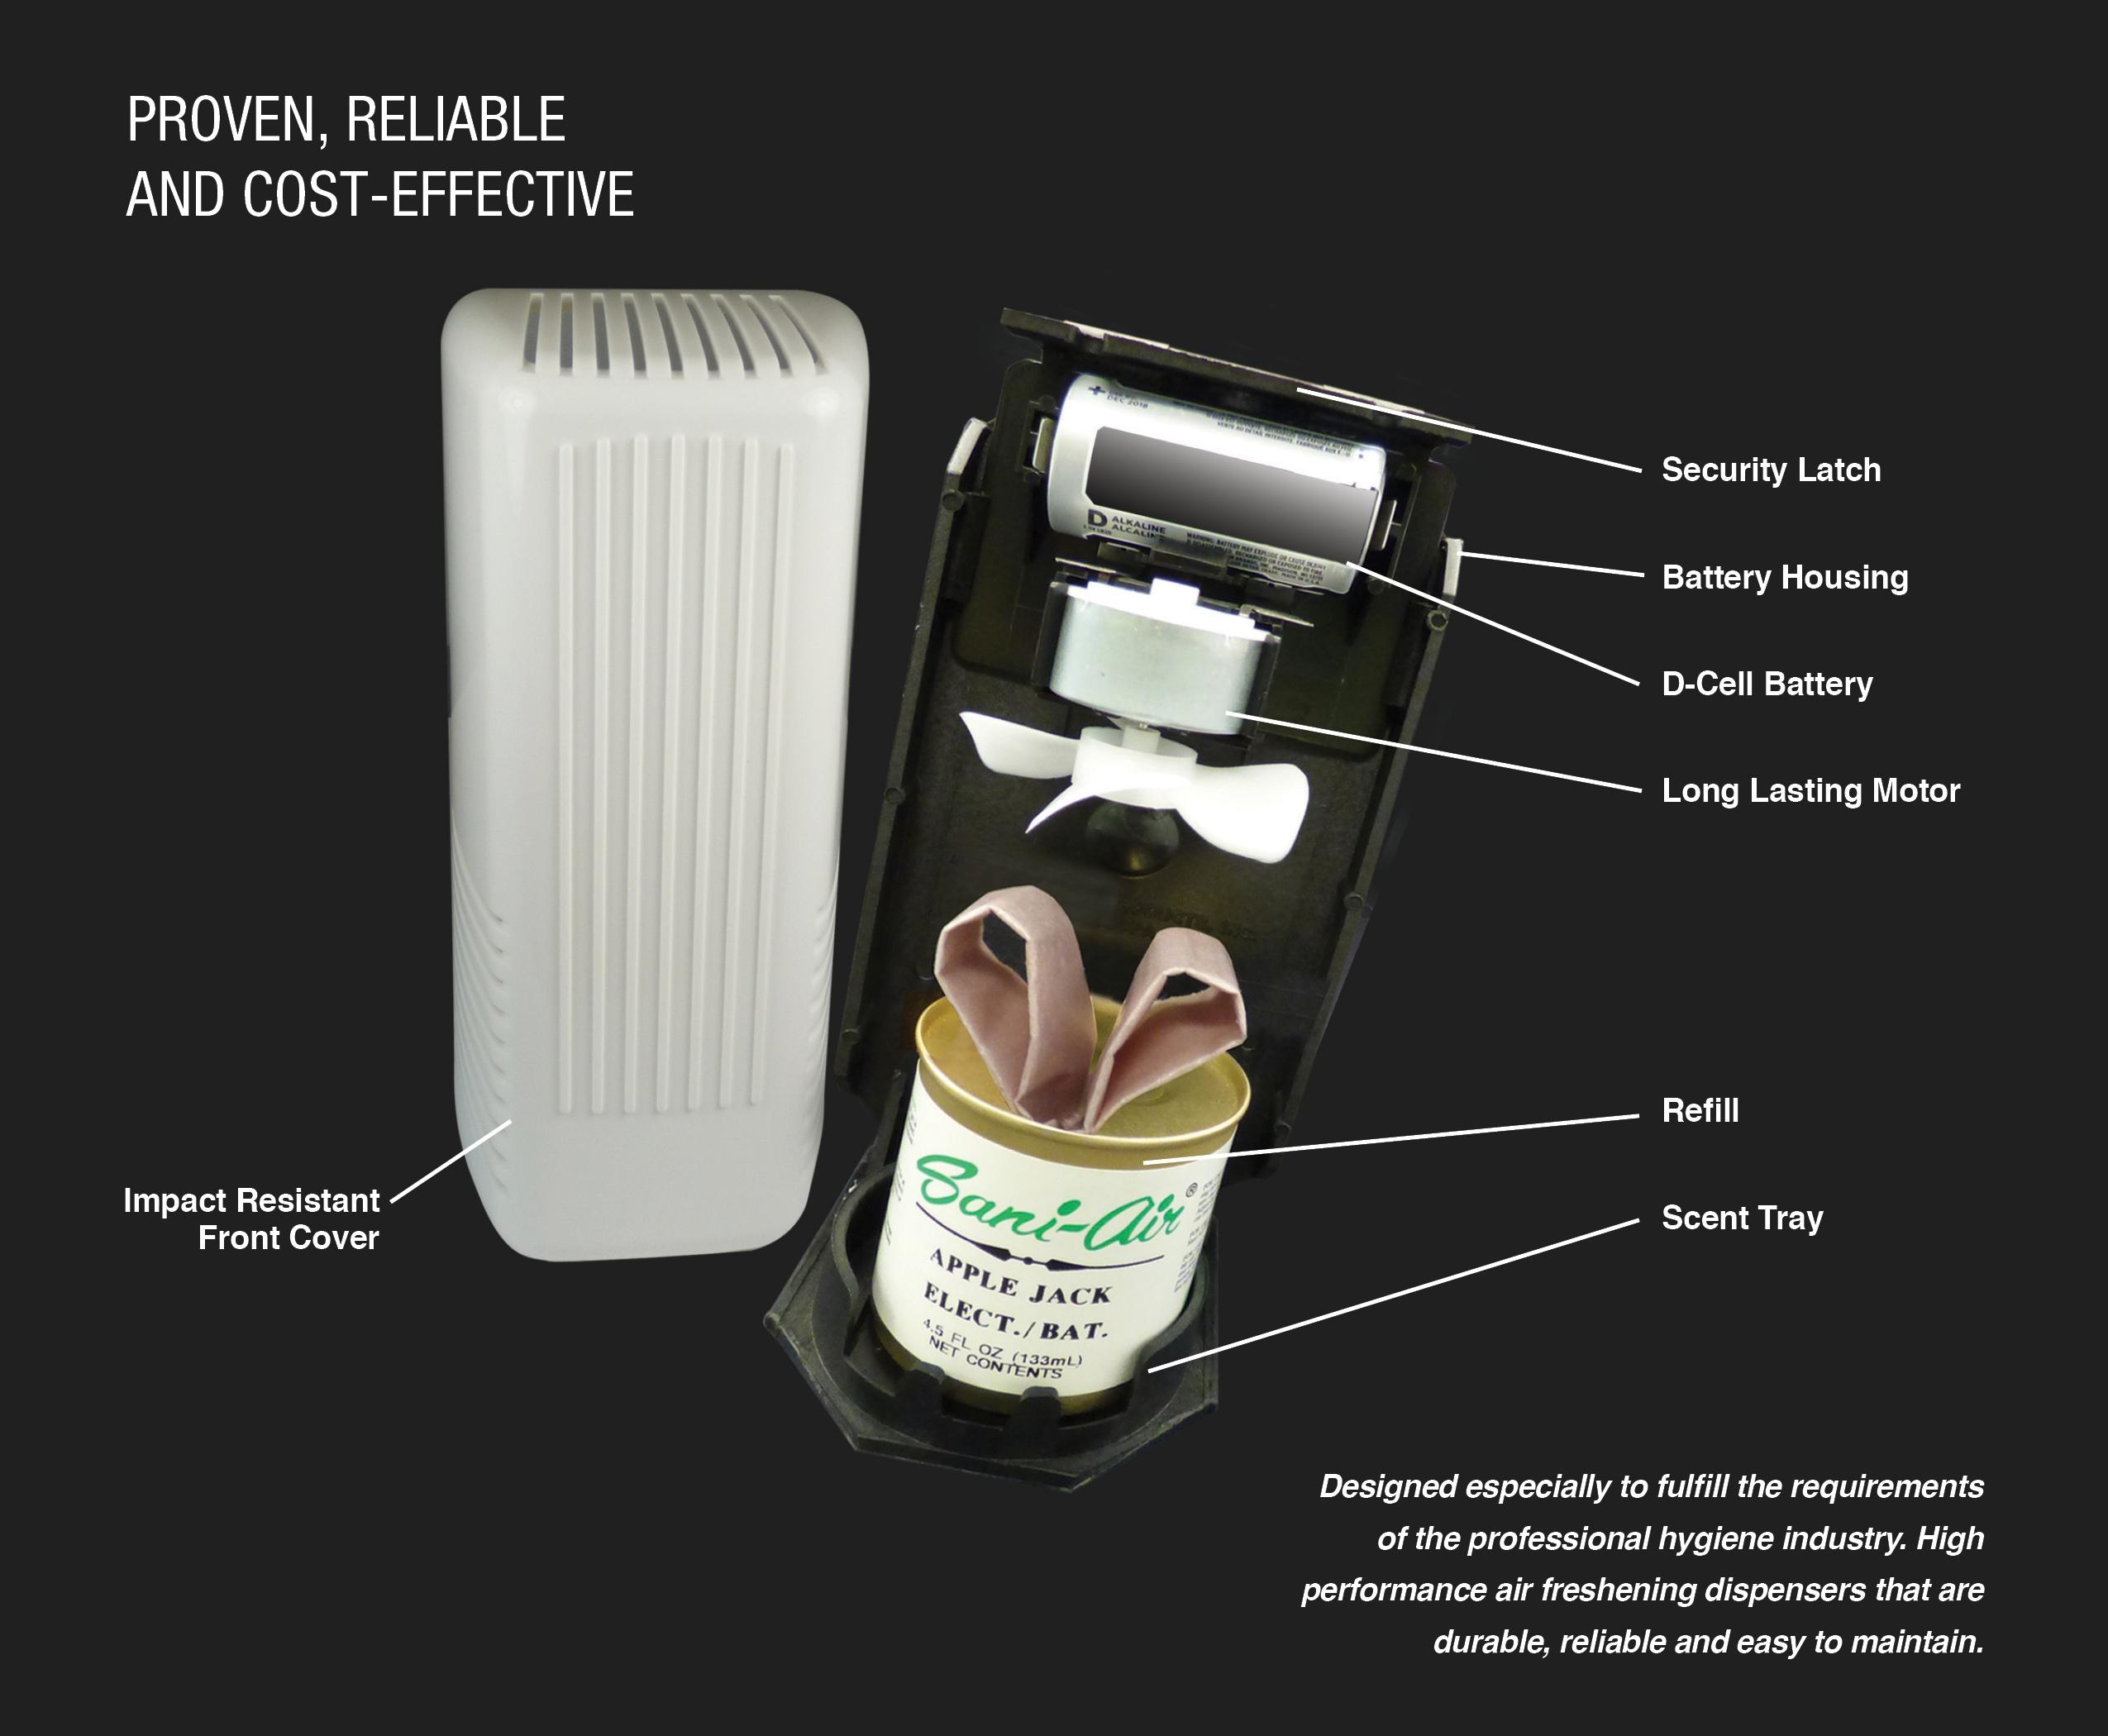 Inside Look at the API-2000 Dispenser